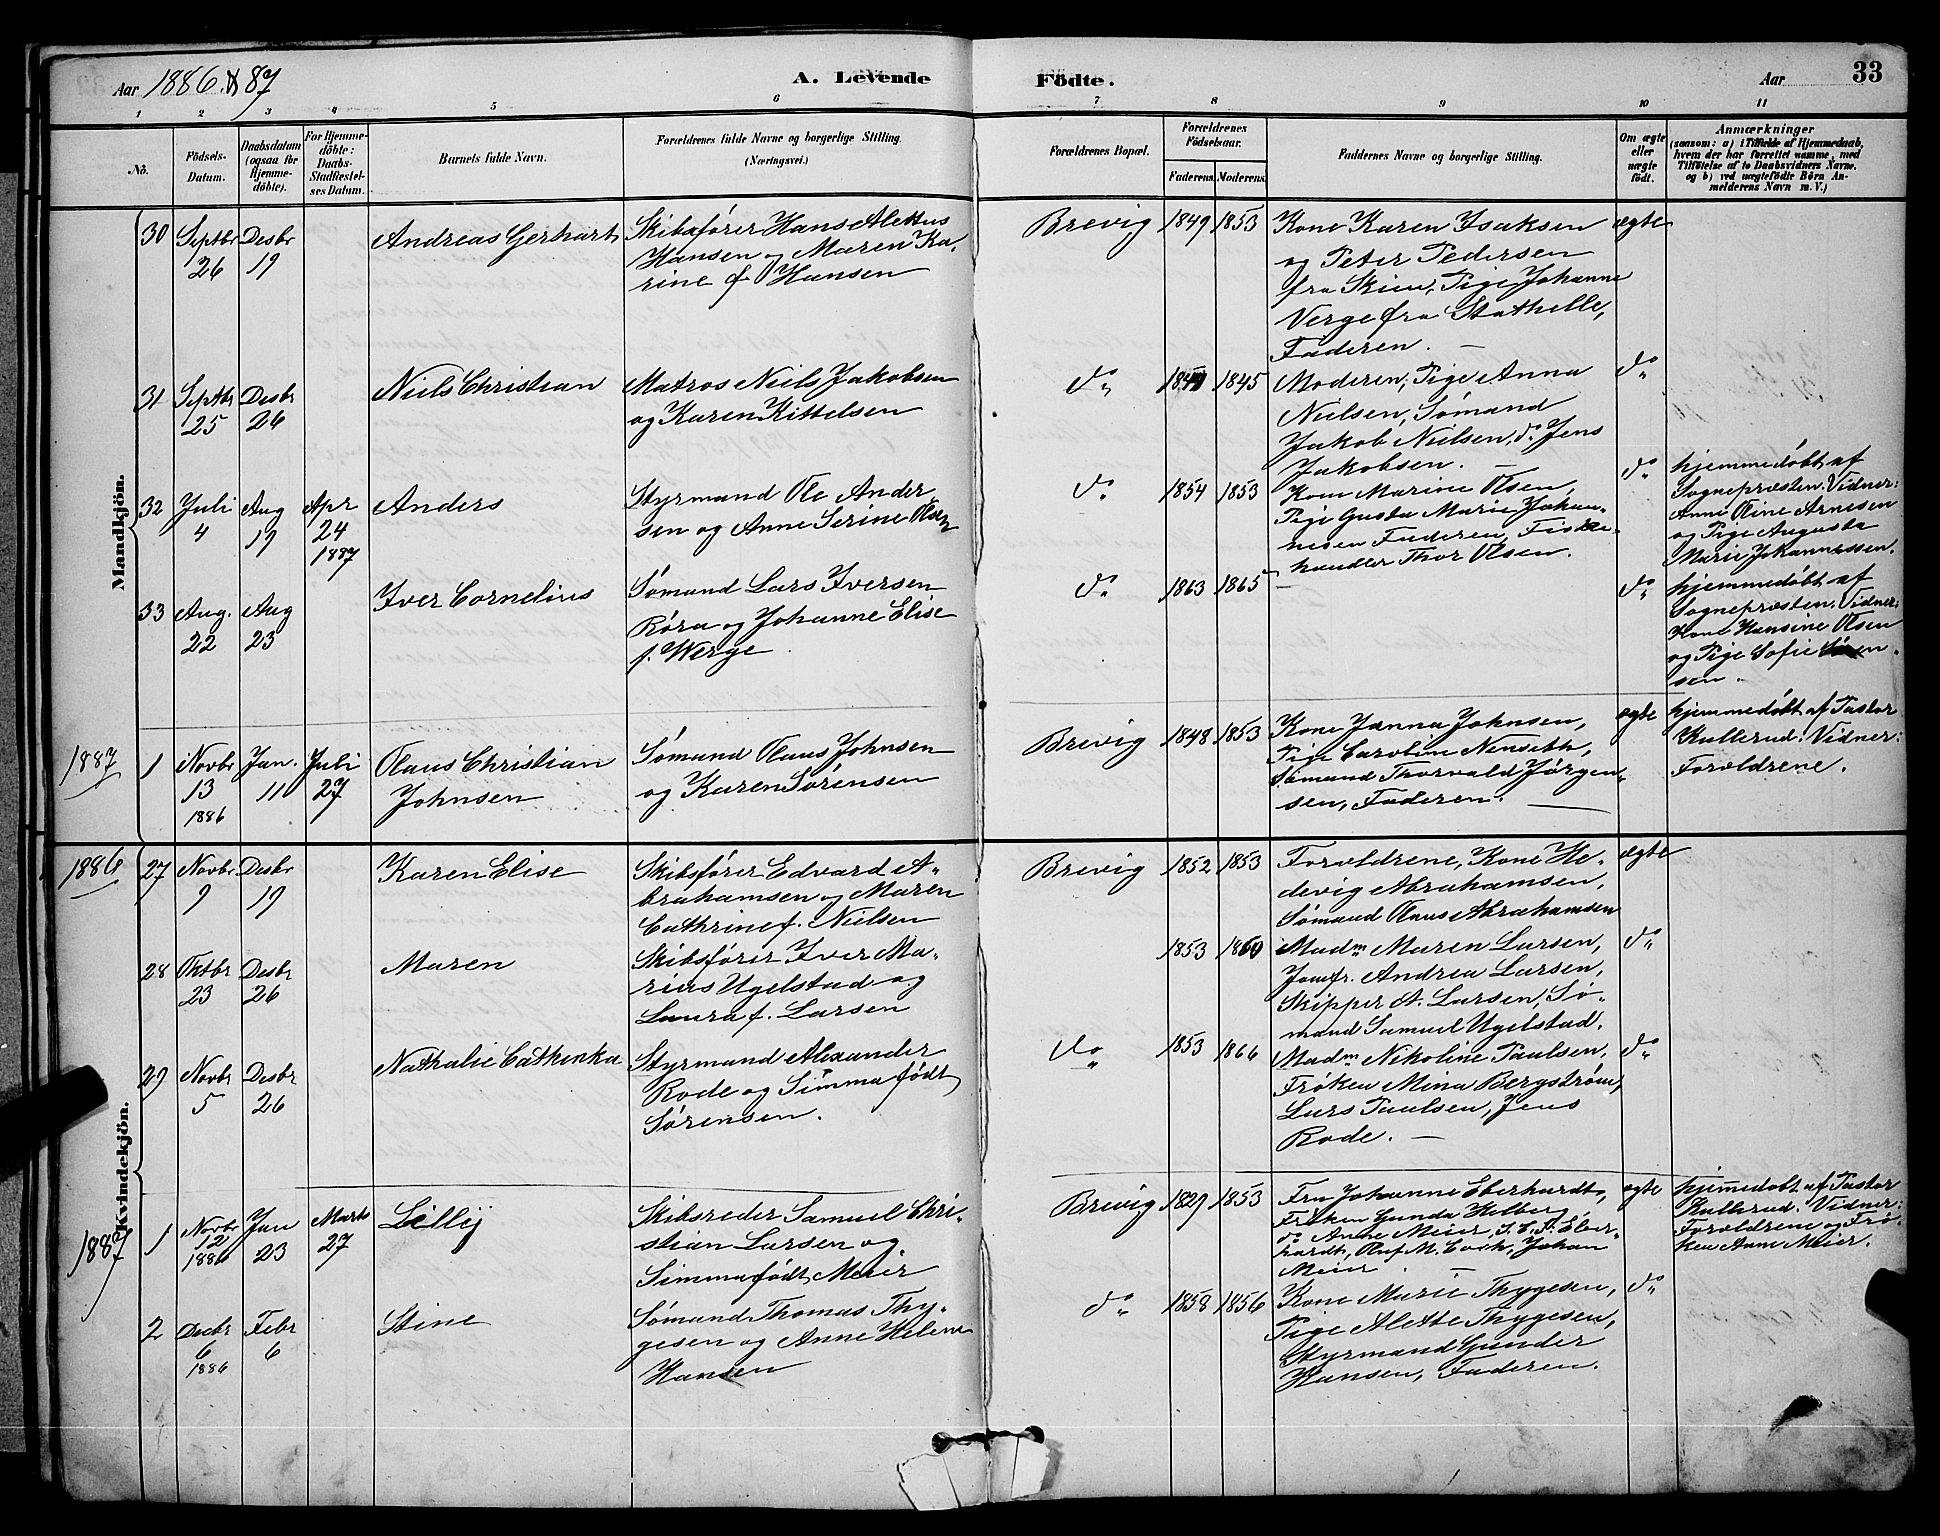 SAKO, Brevik kirkebøker, G/Ga/L0004: Klokkerbok nr. 4, 1882-1900, s. 33